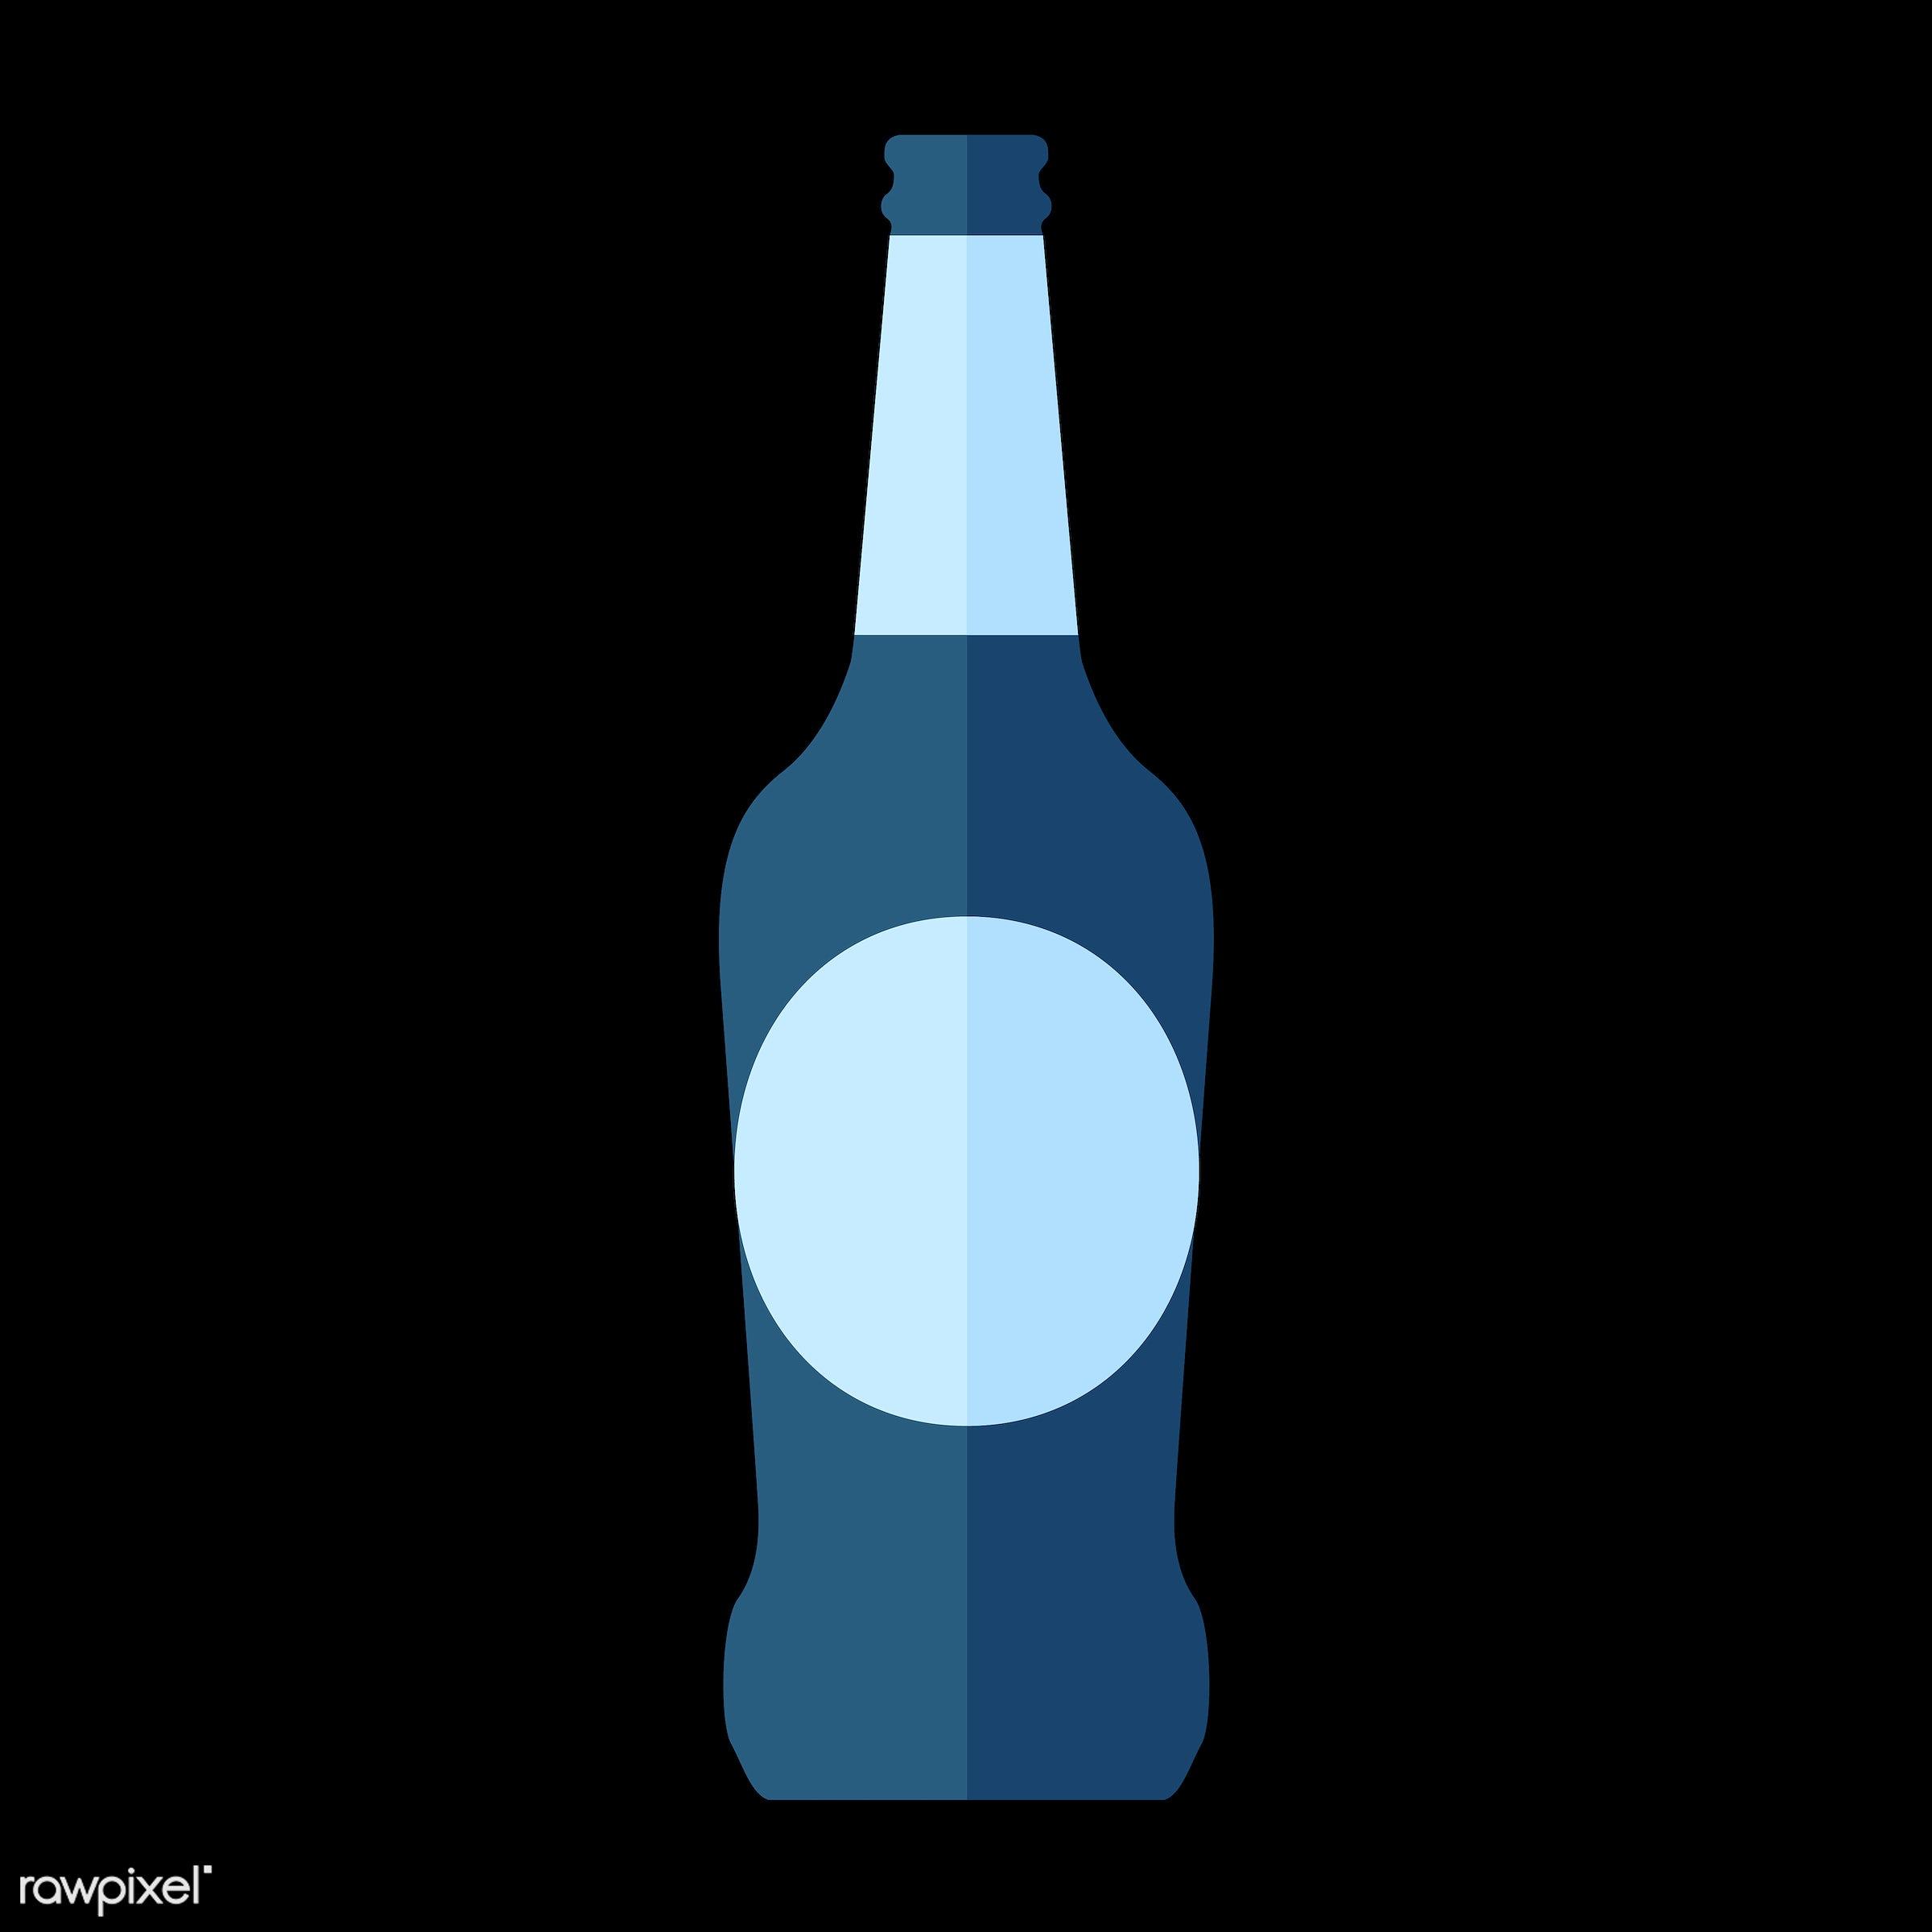 vector, graphic, illustration, icon, symbol, colorful, cute, drink, beverage, water, blue, beer, beer bottle, glass bottle